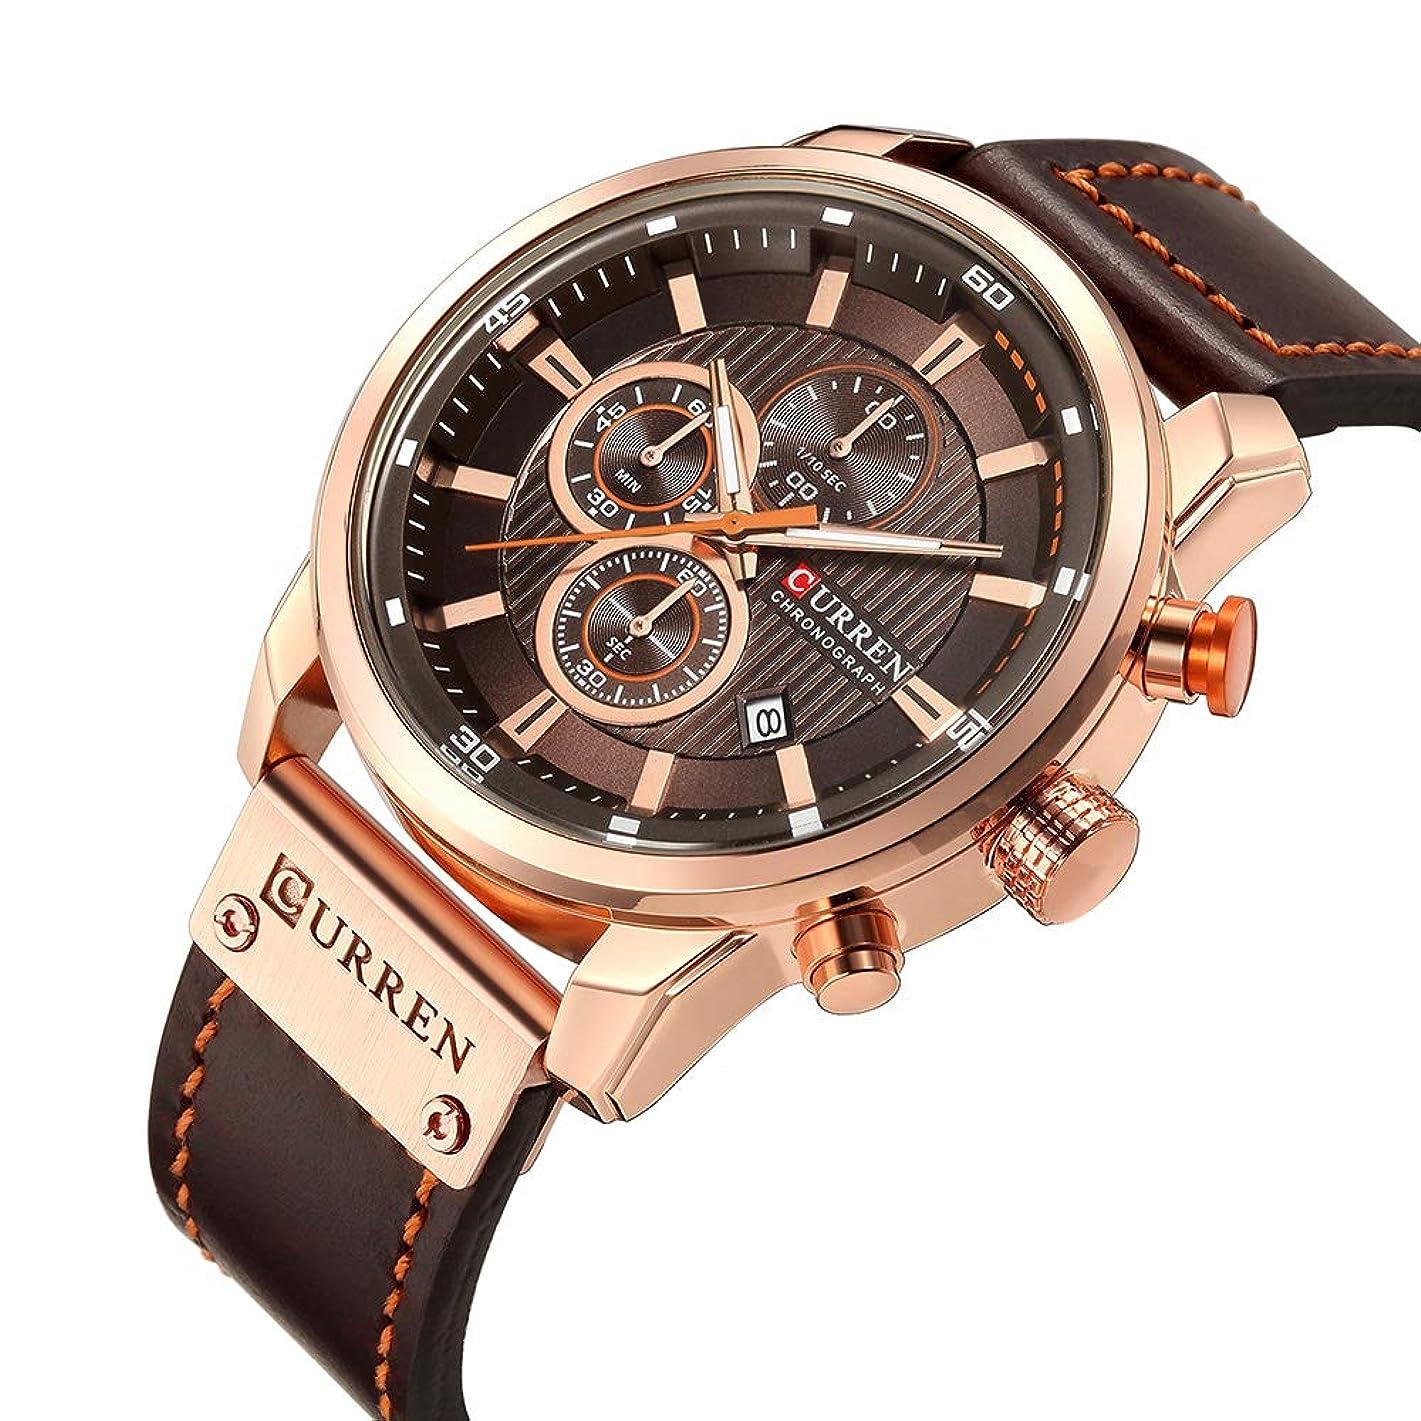 Men Casual Chronograoh Sport Watches Business Dress Leather Quartz Wristwatch with Calendar